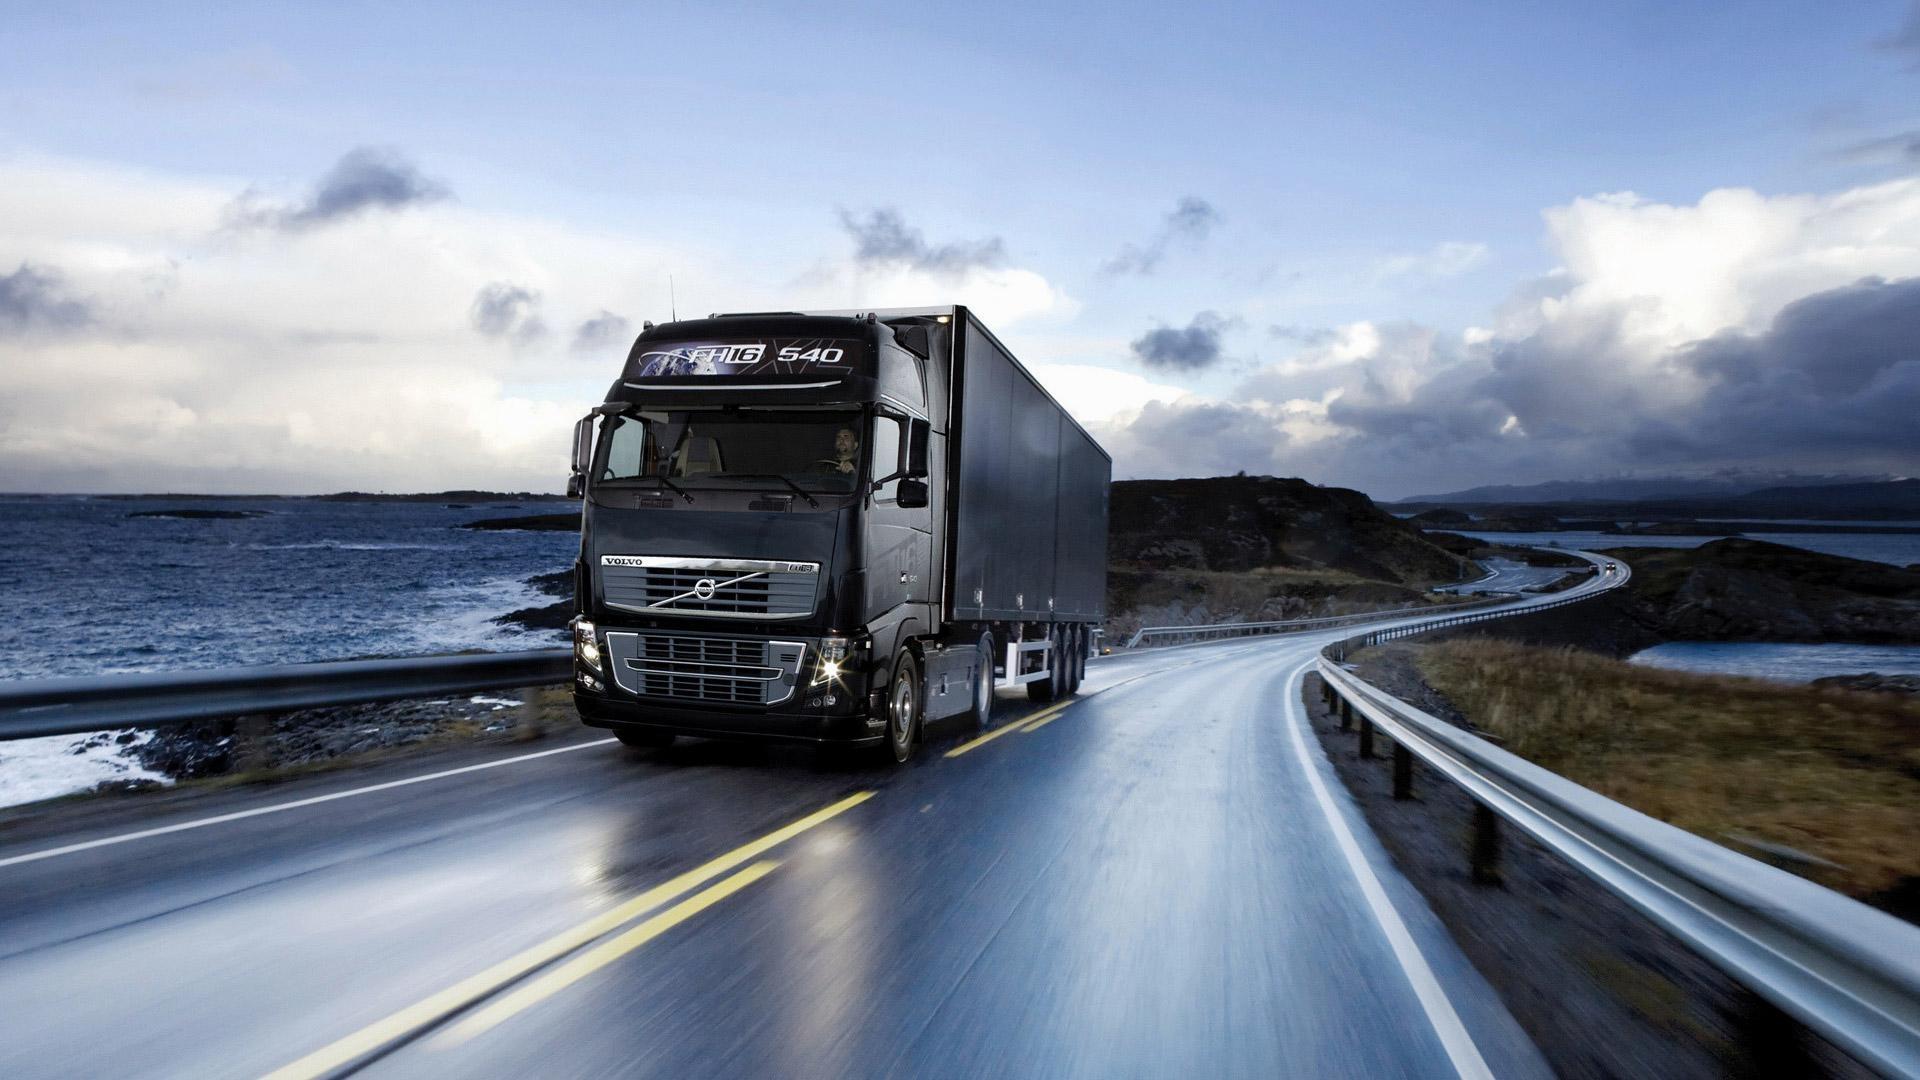 1920x1200 Daf XF Truck 1080p HD Wallpaper Widescreen | kamion | Pinterest | Lamborghini aventador, Lamborghini and Transportation